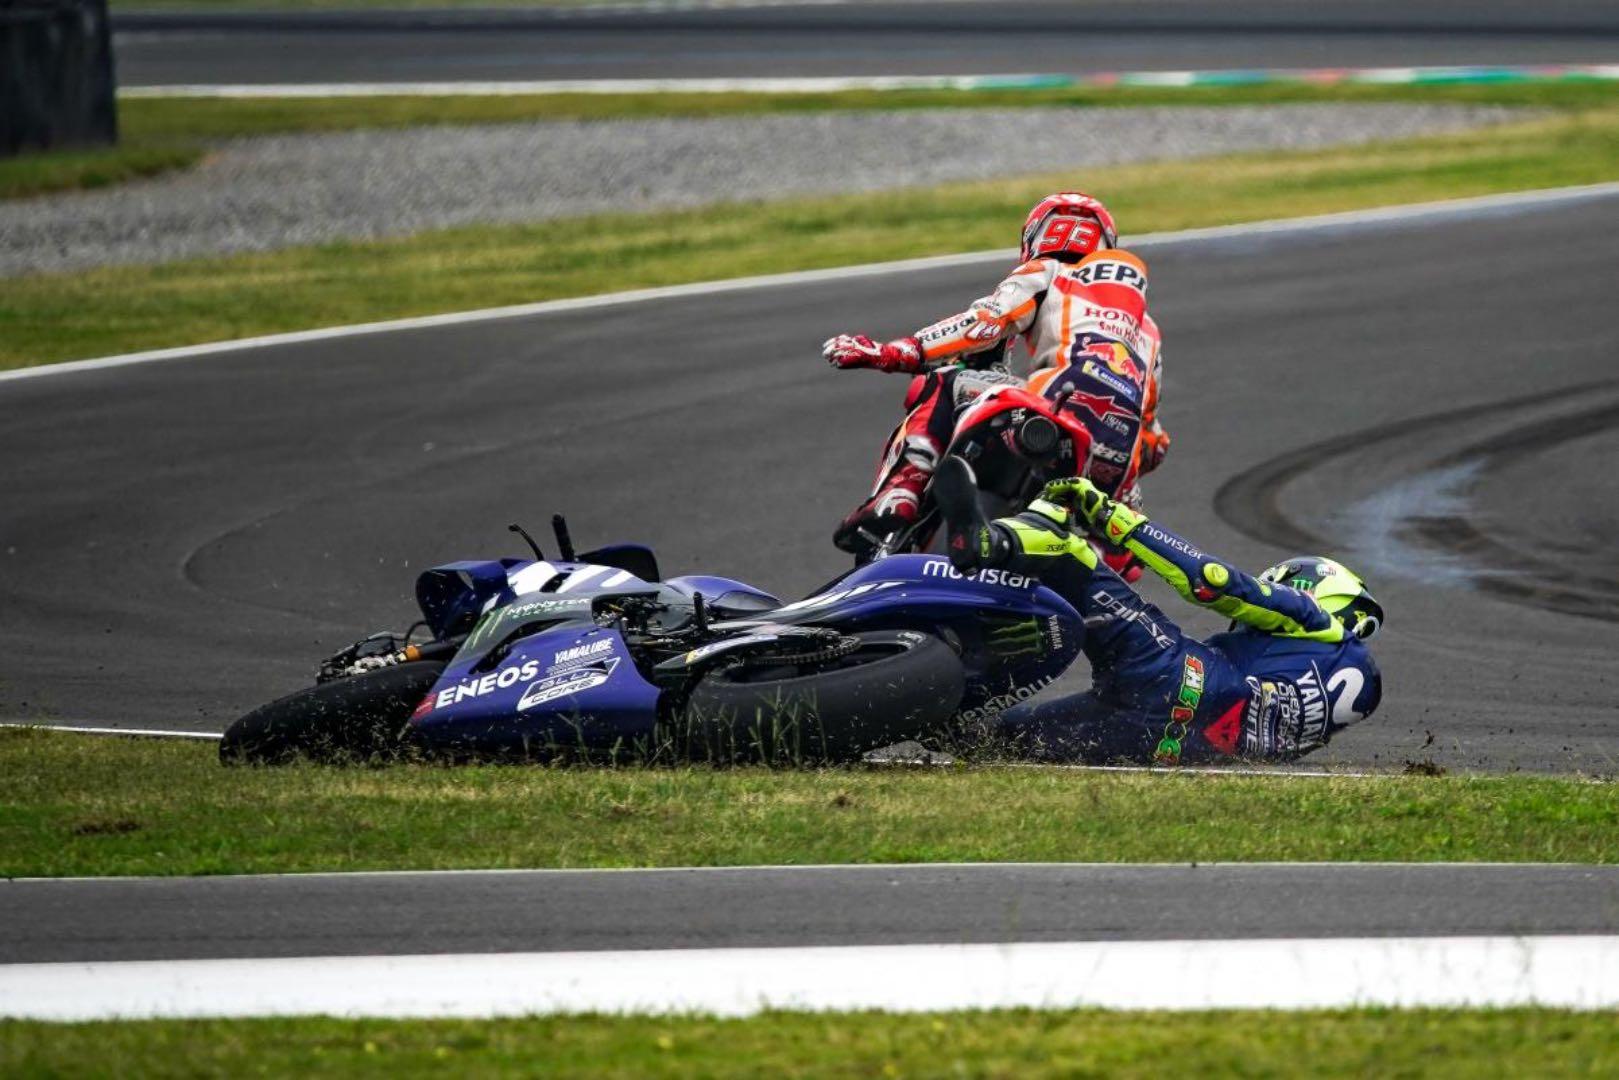 2018 Argentina MotoGP Results Rossi and Marquez Crash